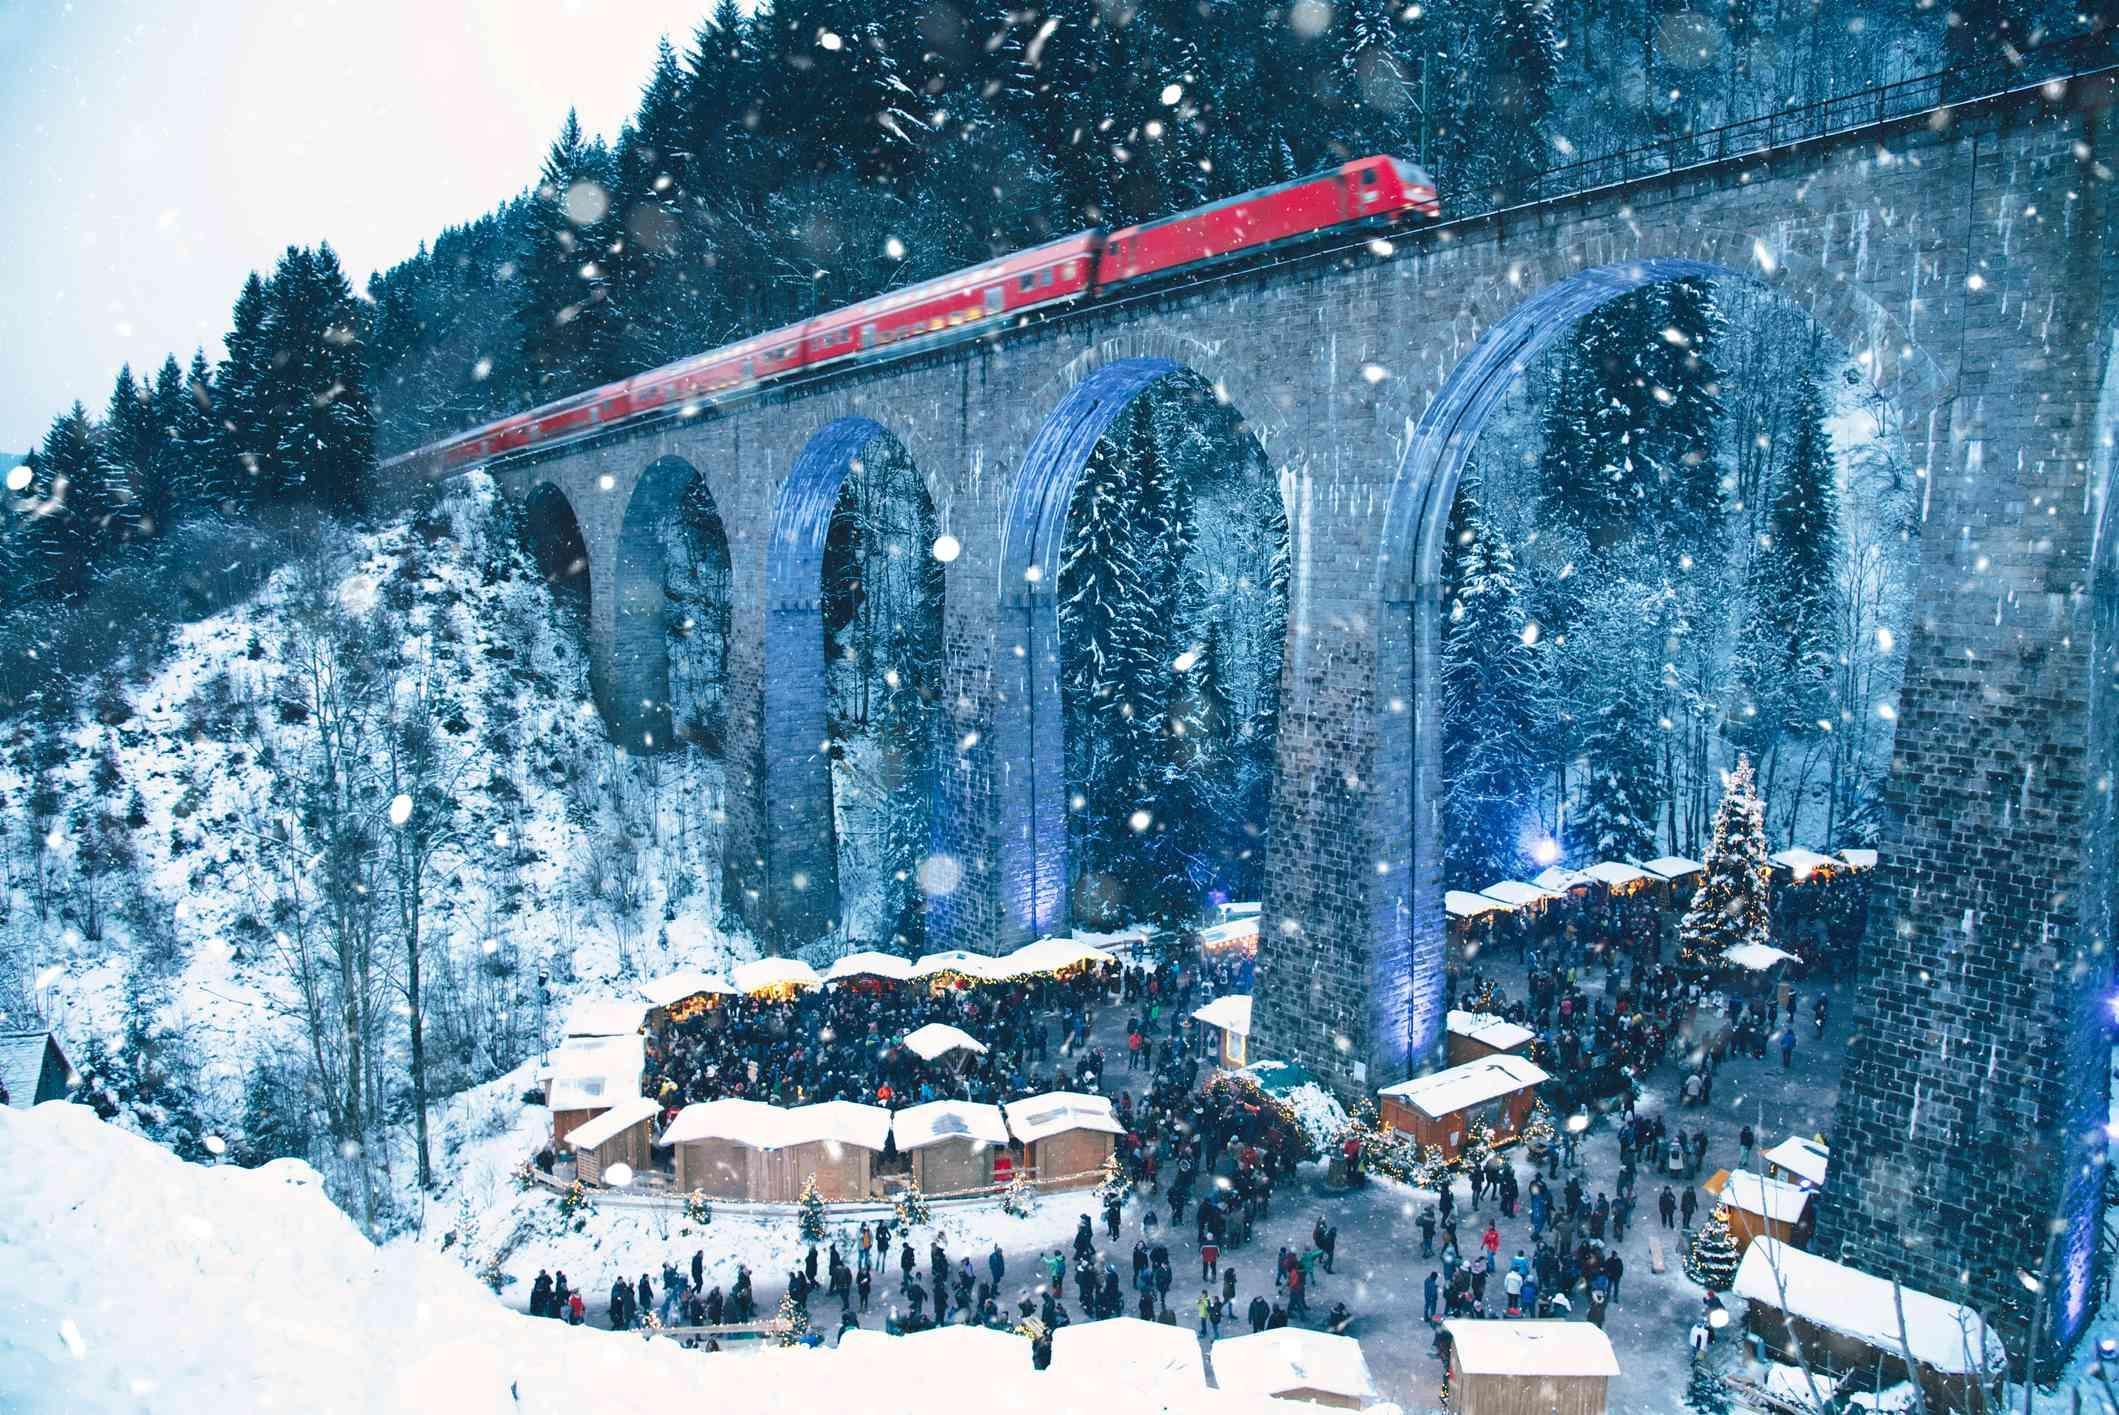 Ravenna Gorge in snow